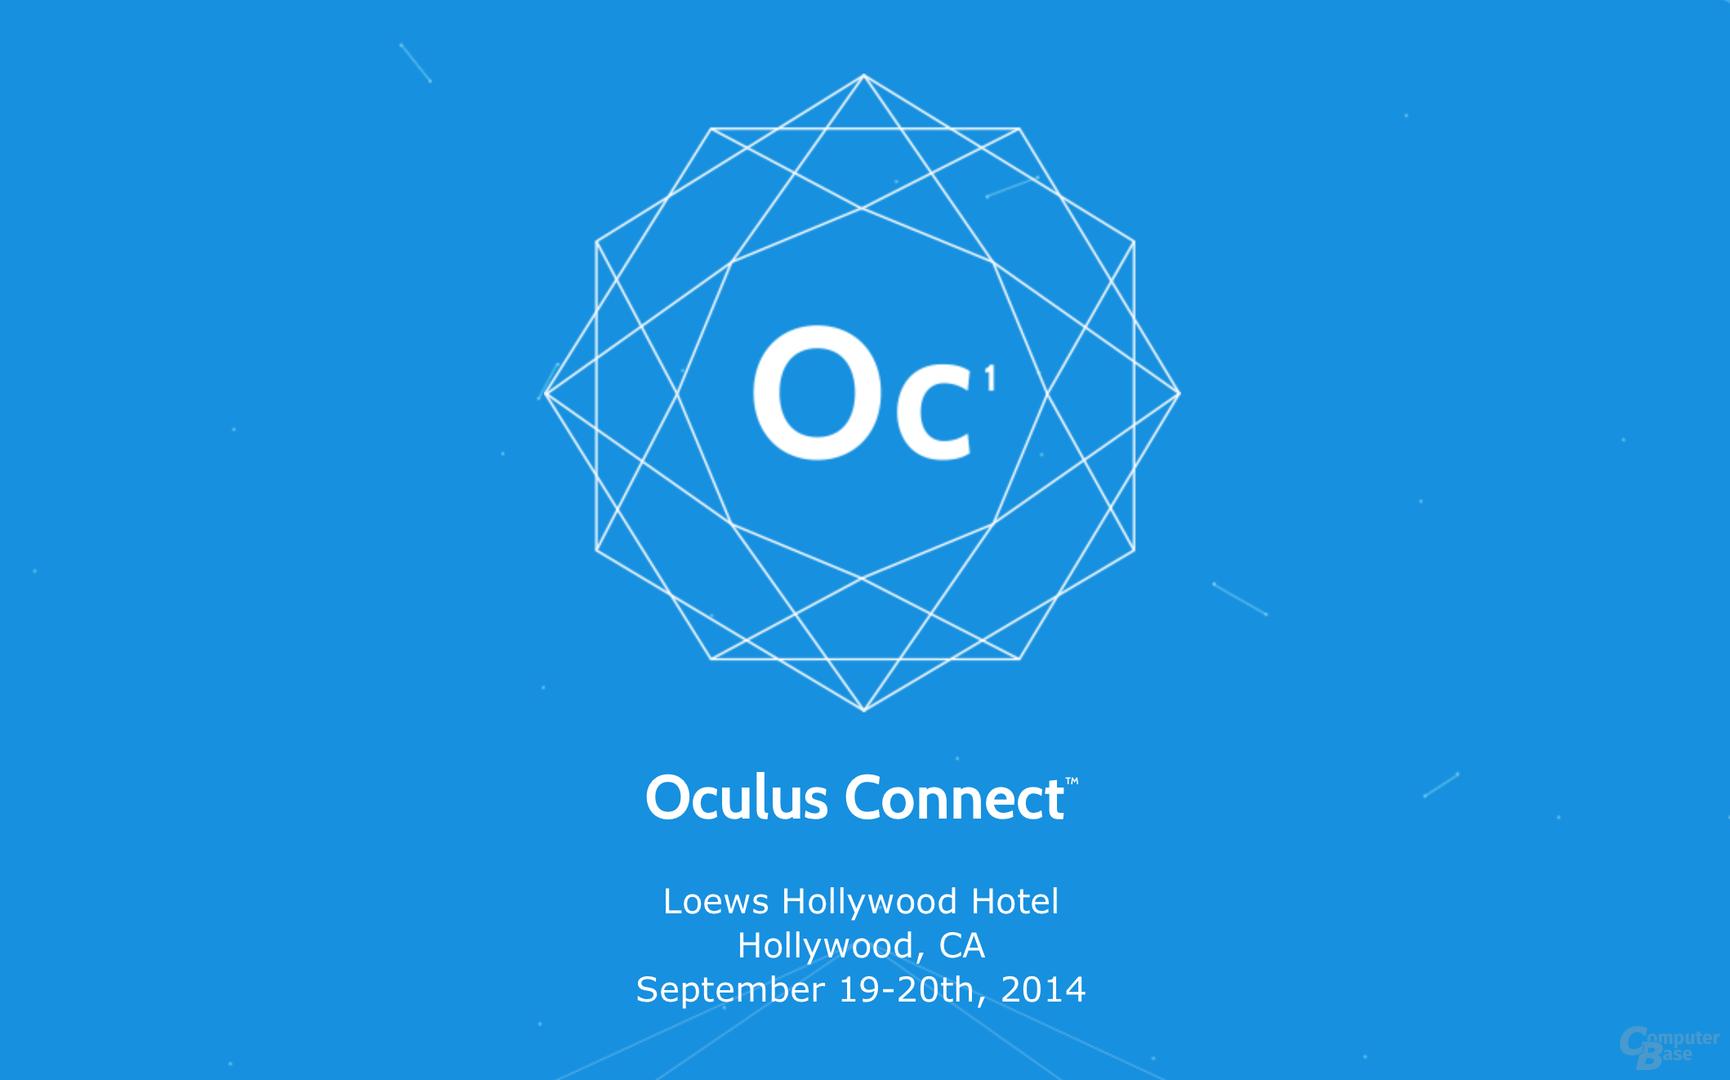 Vom 19. bis 20. September in Hollywood: die Oculus Connect